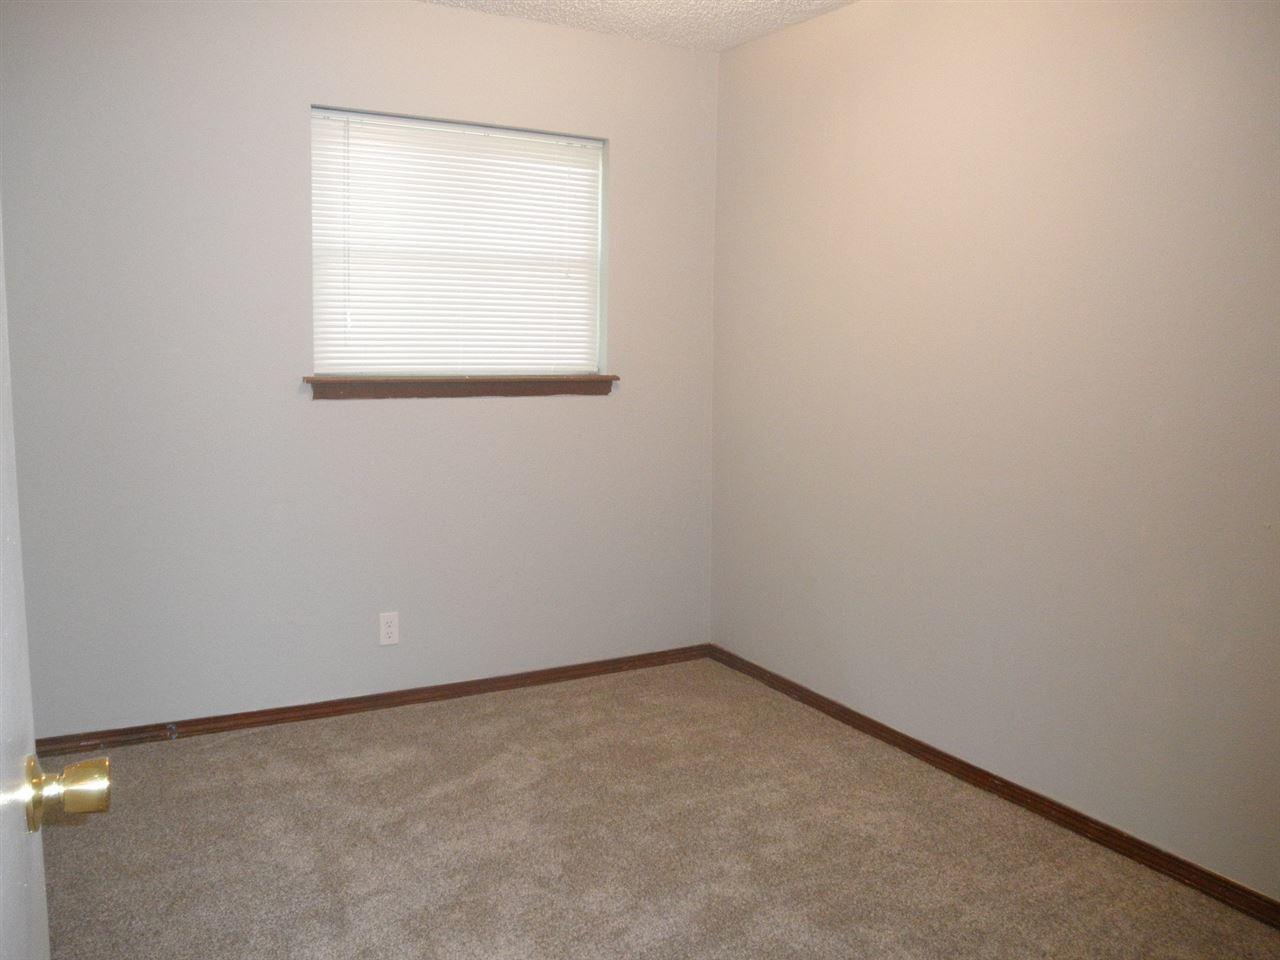 Sold Intraoffice W/MLS | 1209 N Ash Ponca City, OK 74601 6